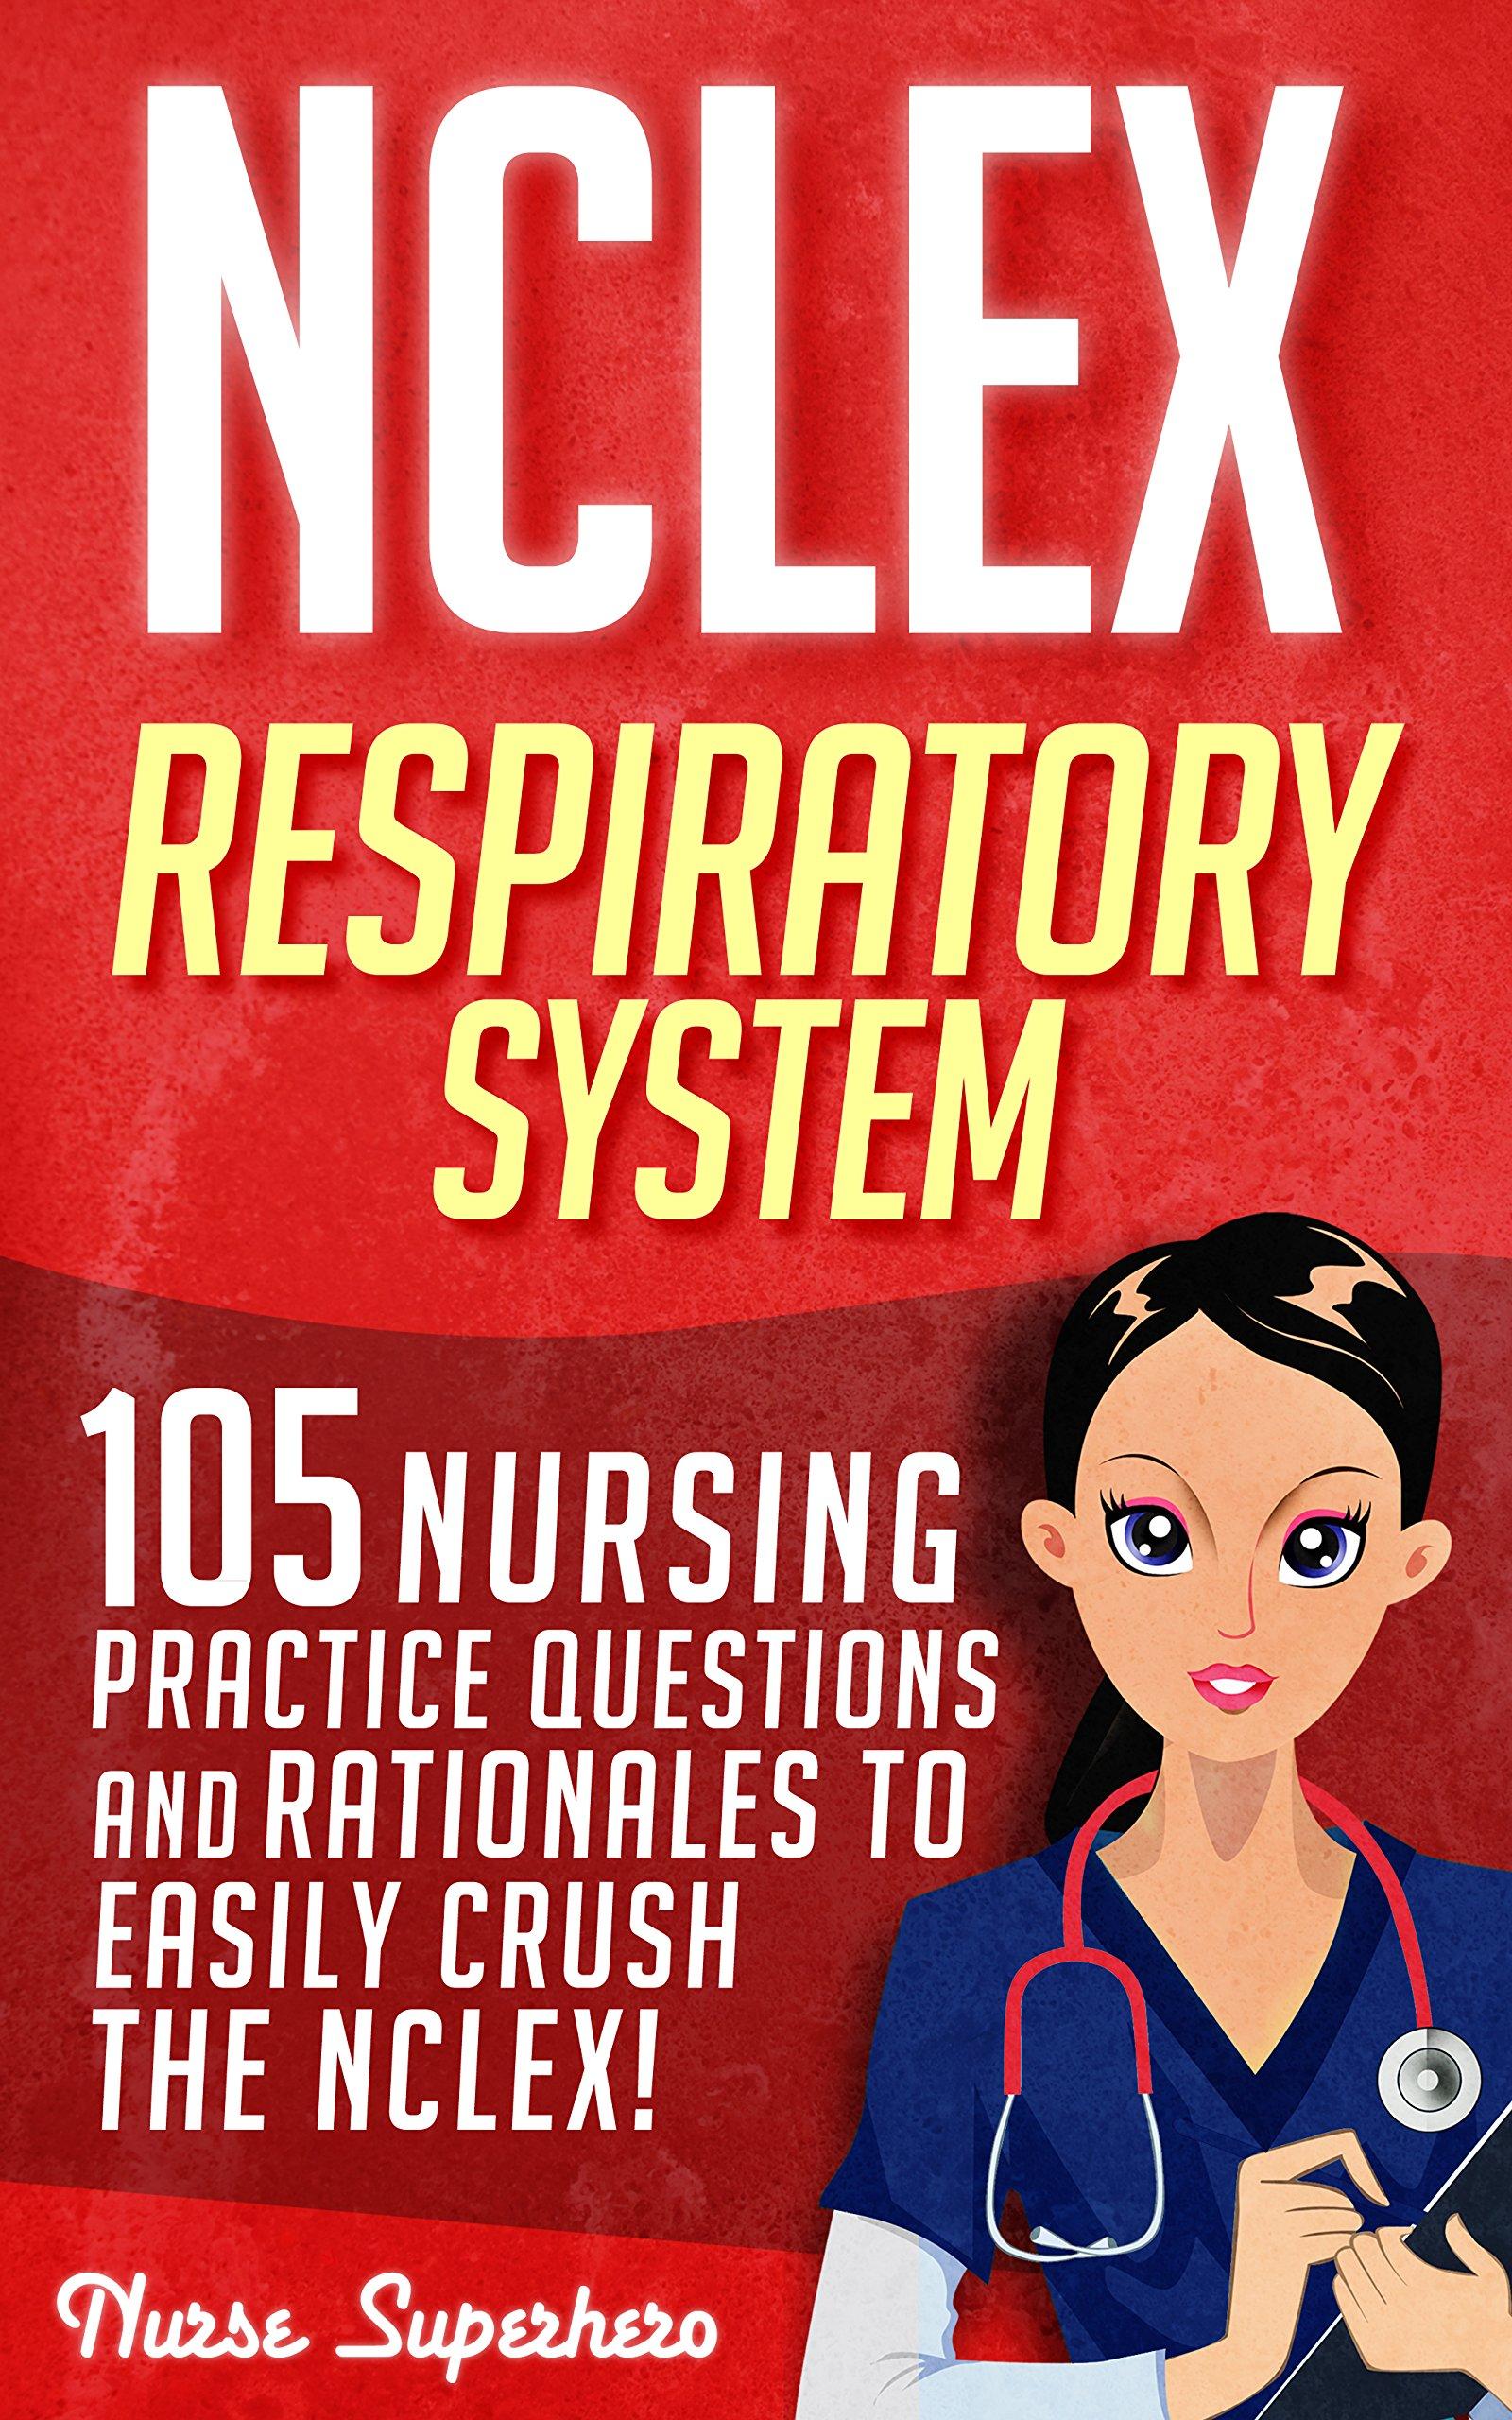 Oxford Handbook of Respiratory Medicine (Oxford Handbooks Series)